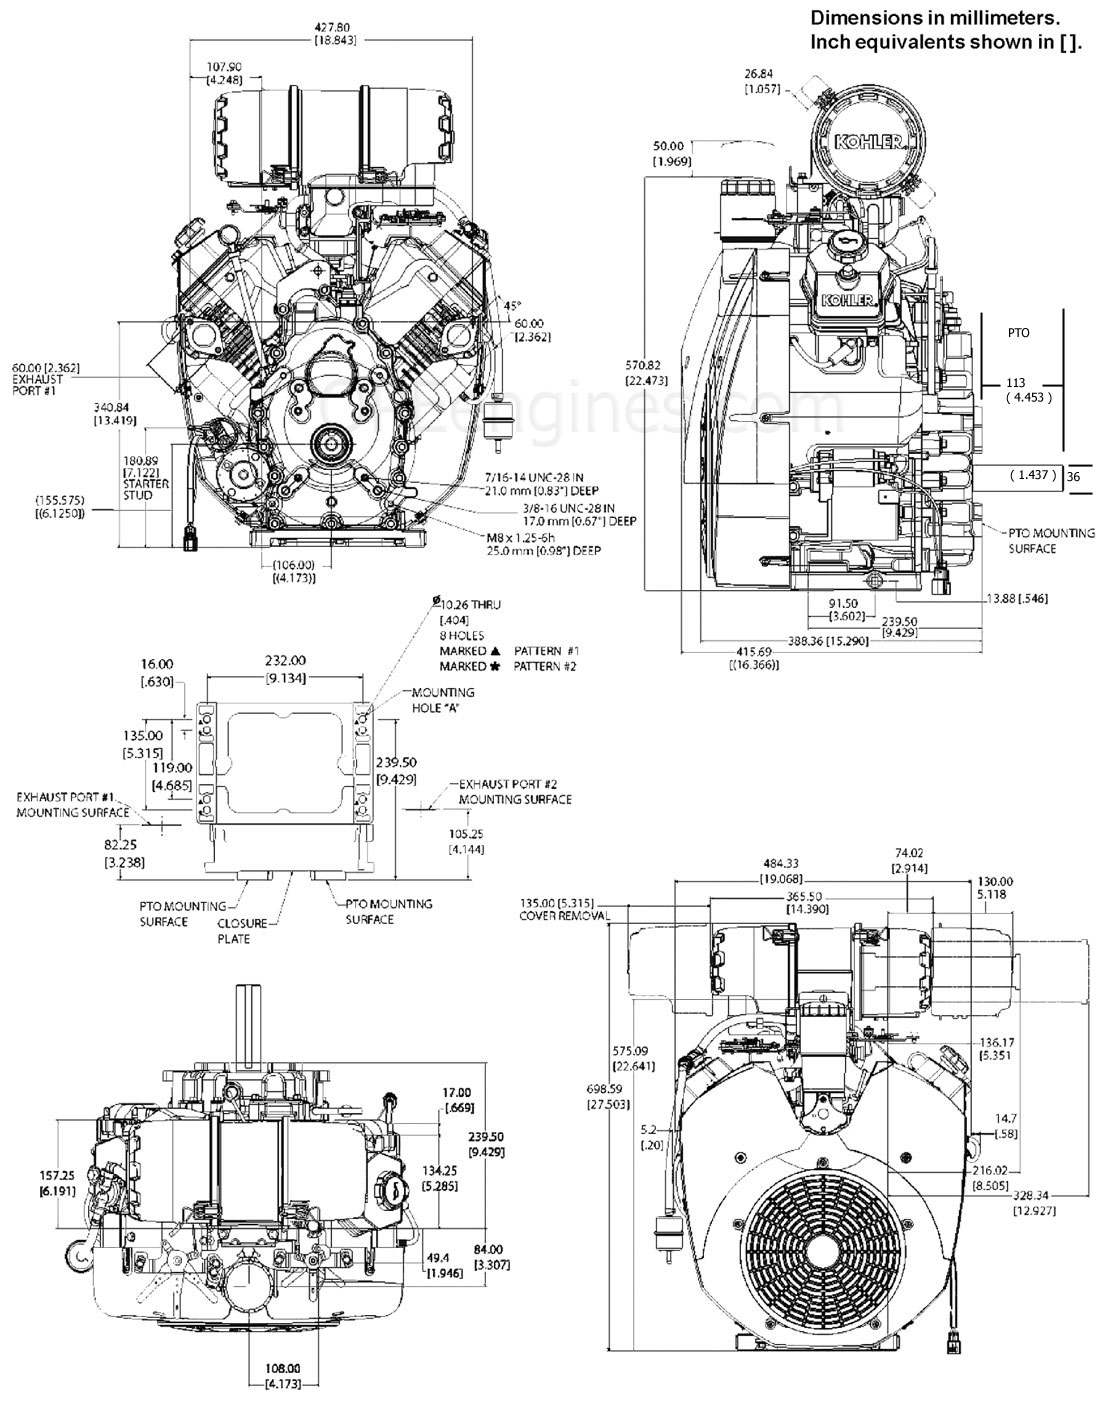 CH980_drawings?resize=680%2C878&ssl=1 25 hp kohler wiring diagram kohler command 25 hp diagram, kohler kohler motor wiring diagram at bayanpartner.co